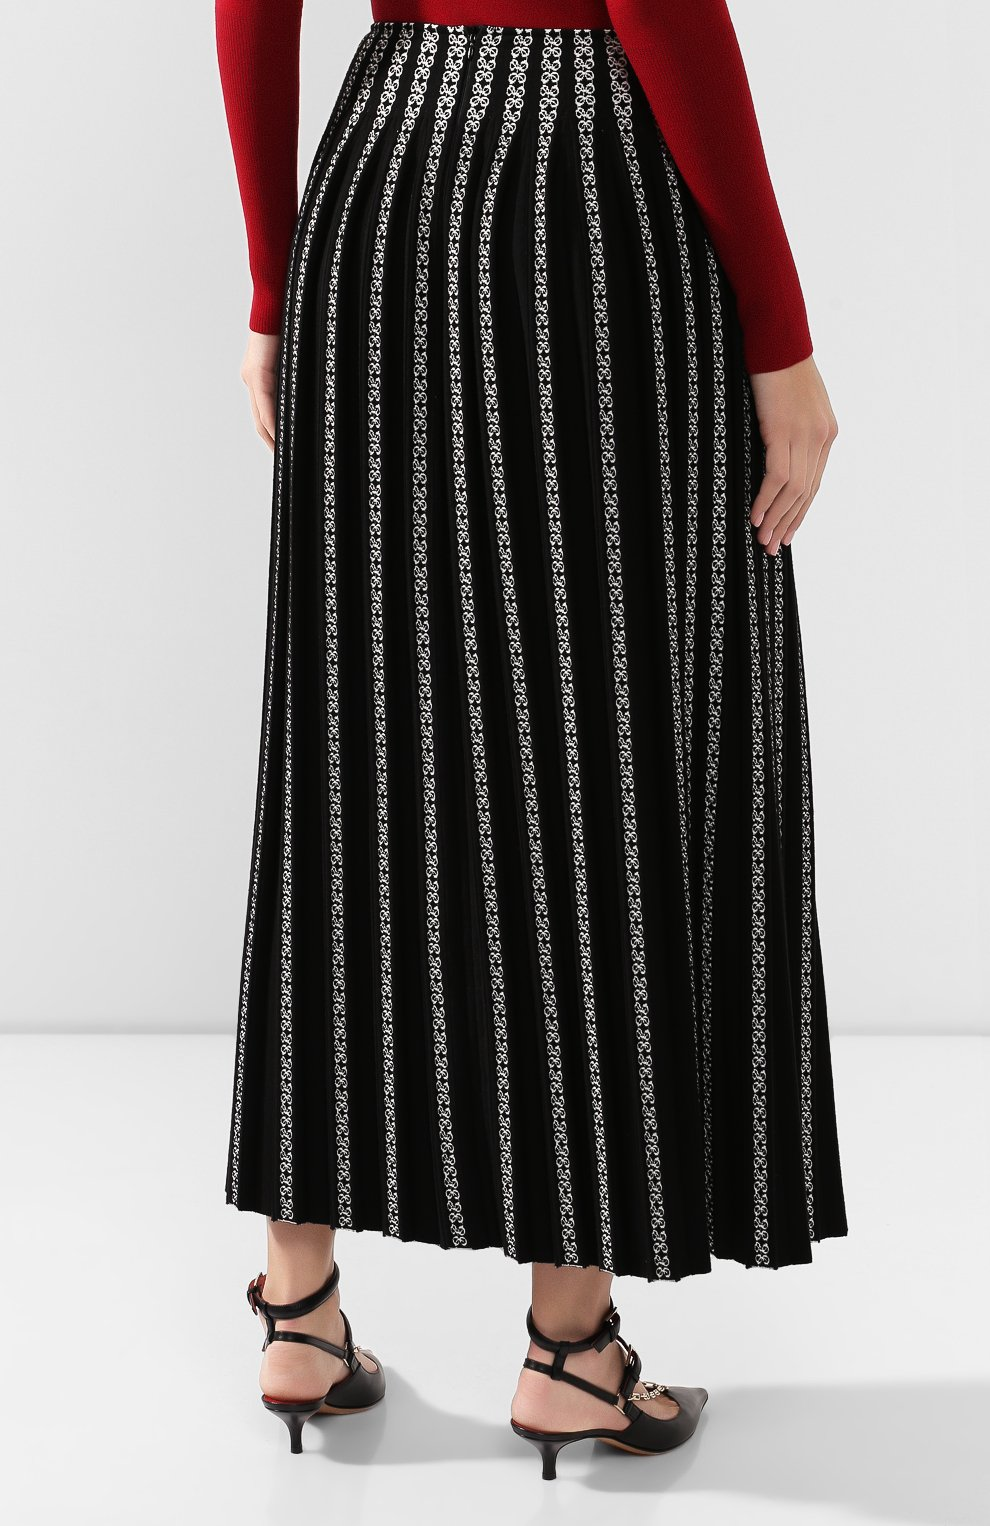 Женская юбка ALAIA черно-белого цвета, арт. 9W9JE38LM490 | Фото 4